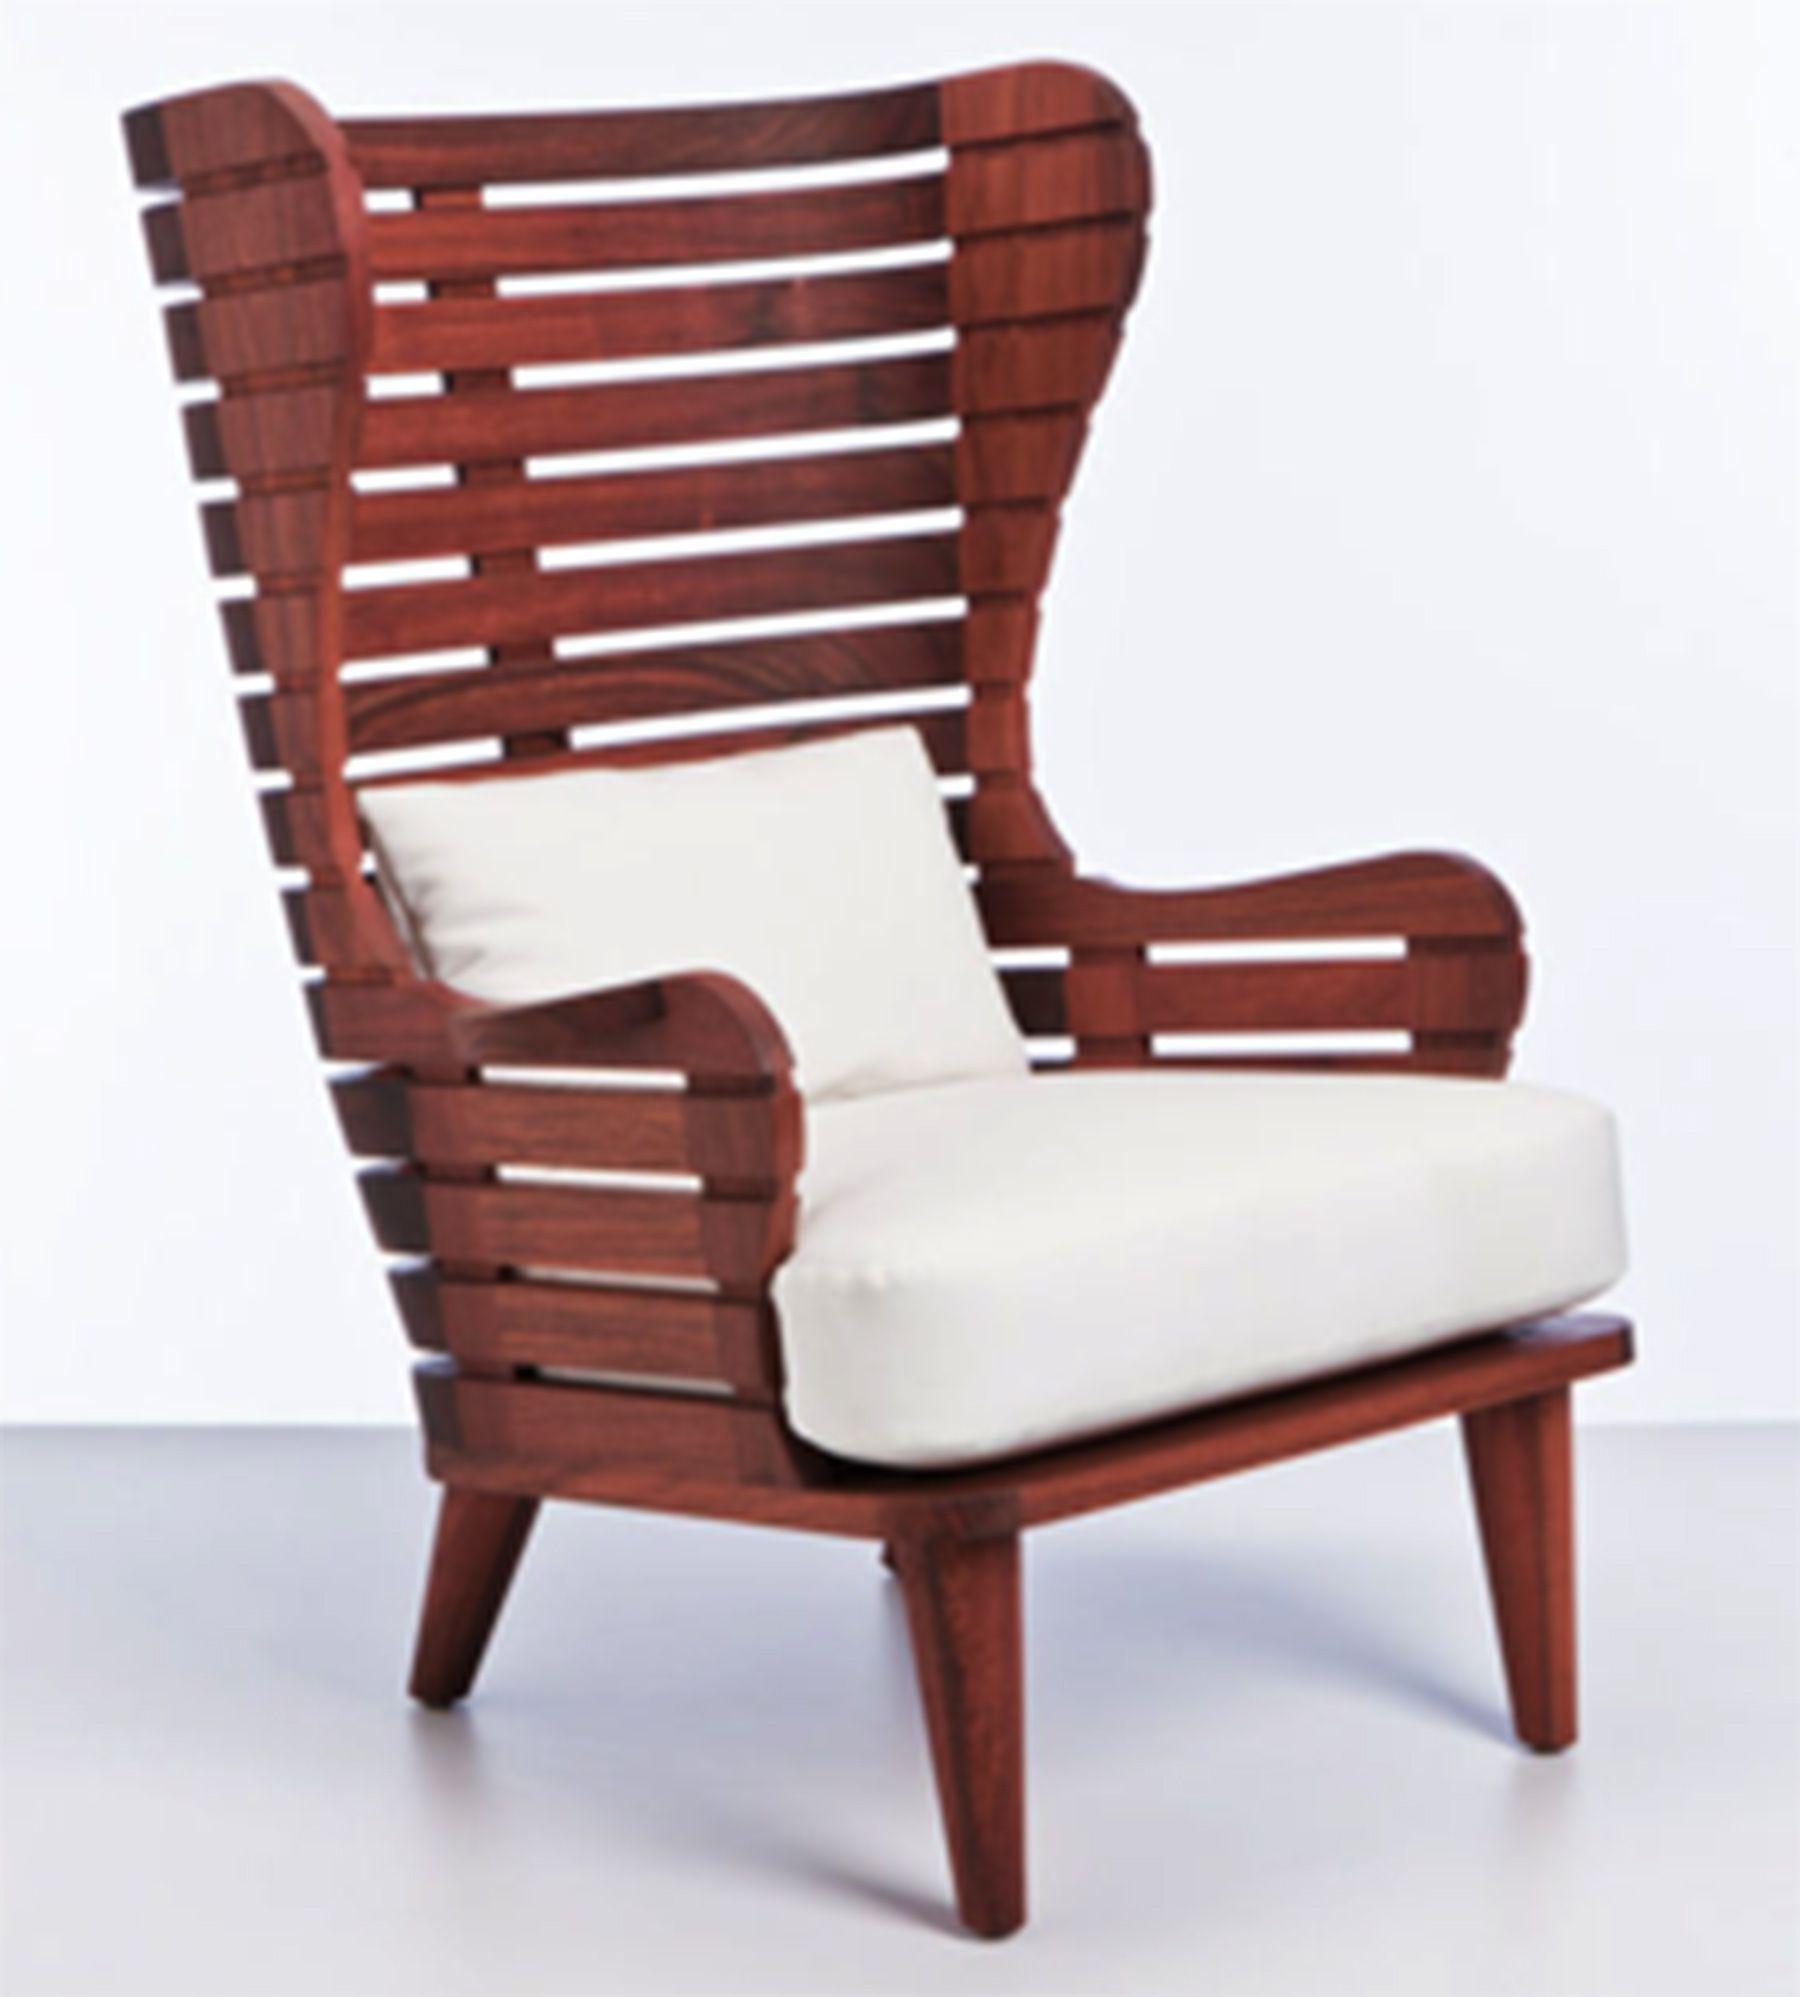 Park Art My WordPress Blog_Outdoor Wingback Chair And Ottoman